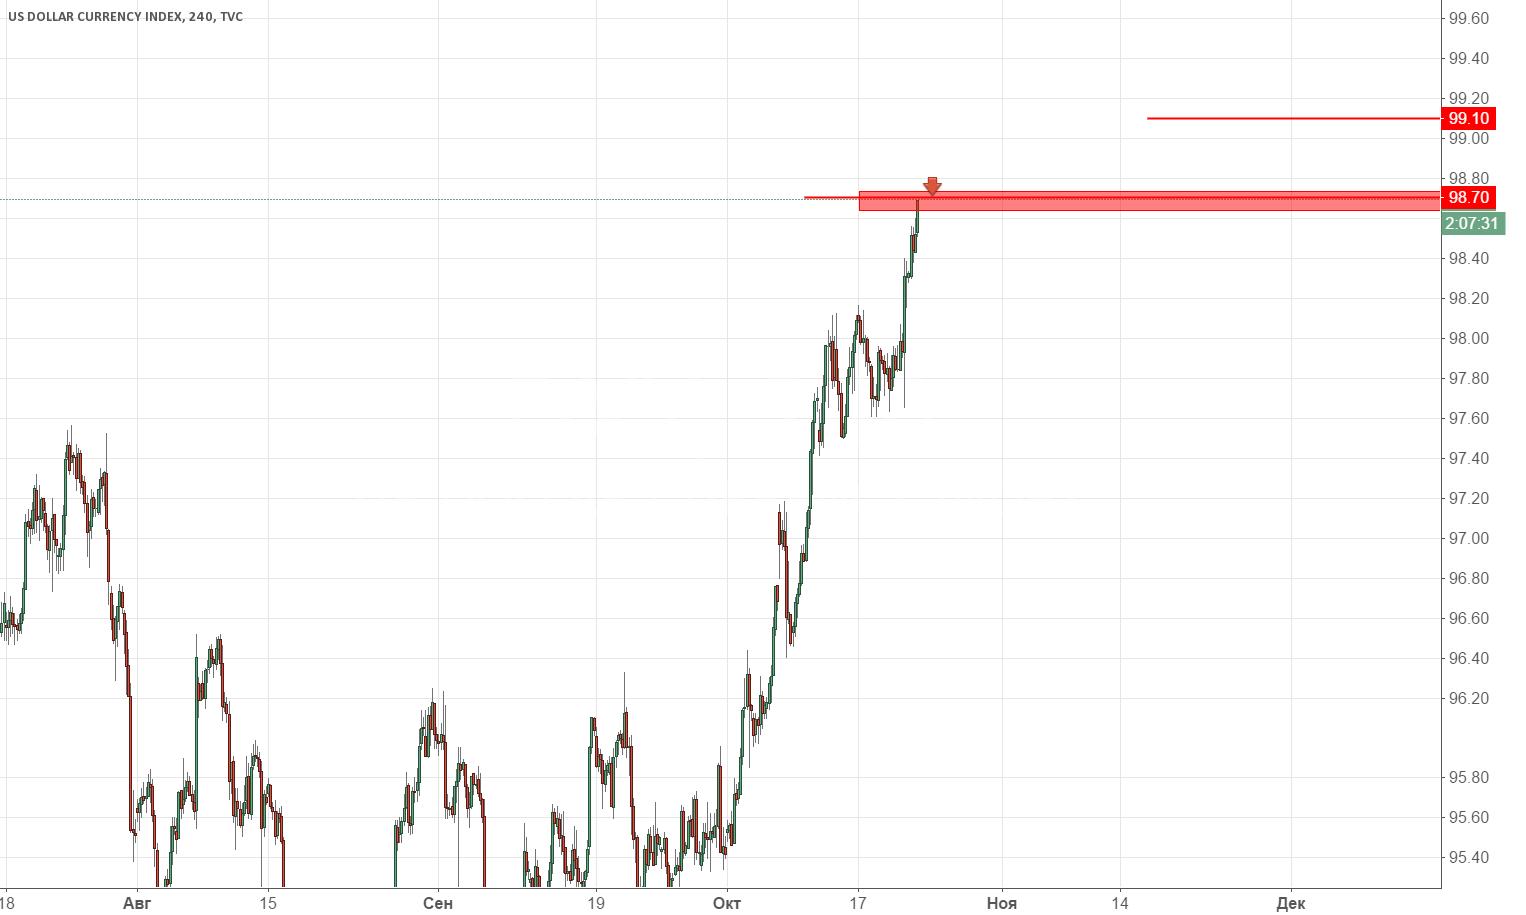 Индекс доллара продажа 98.70